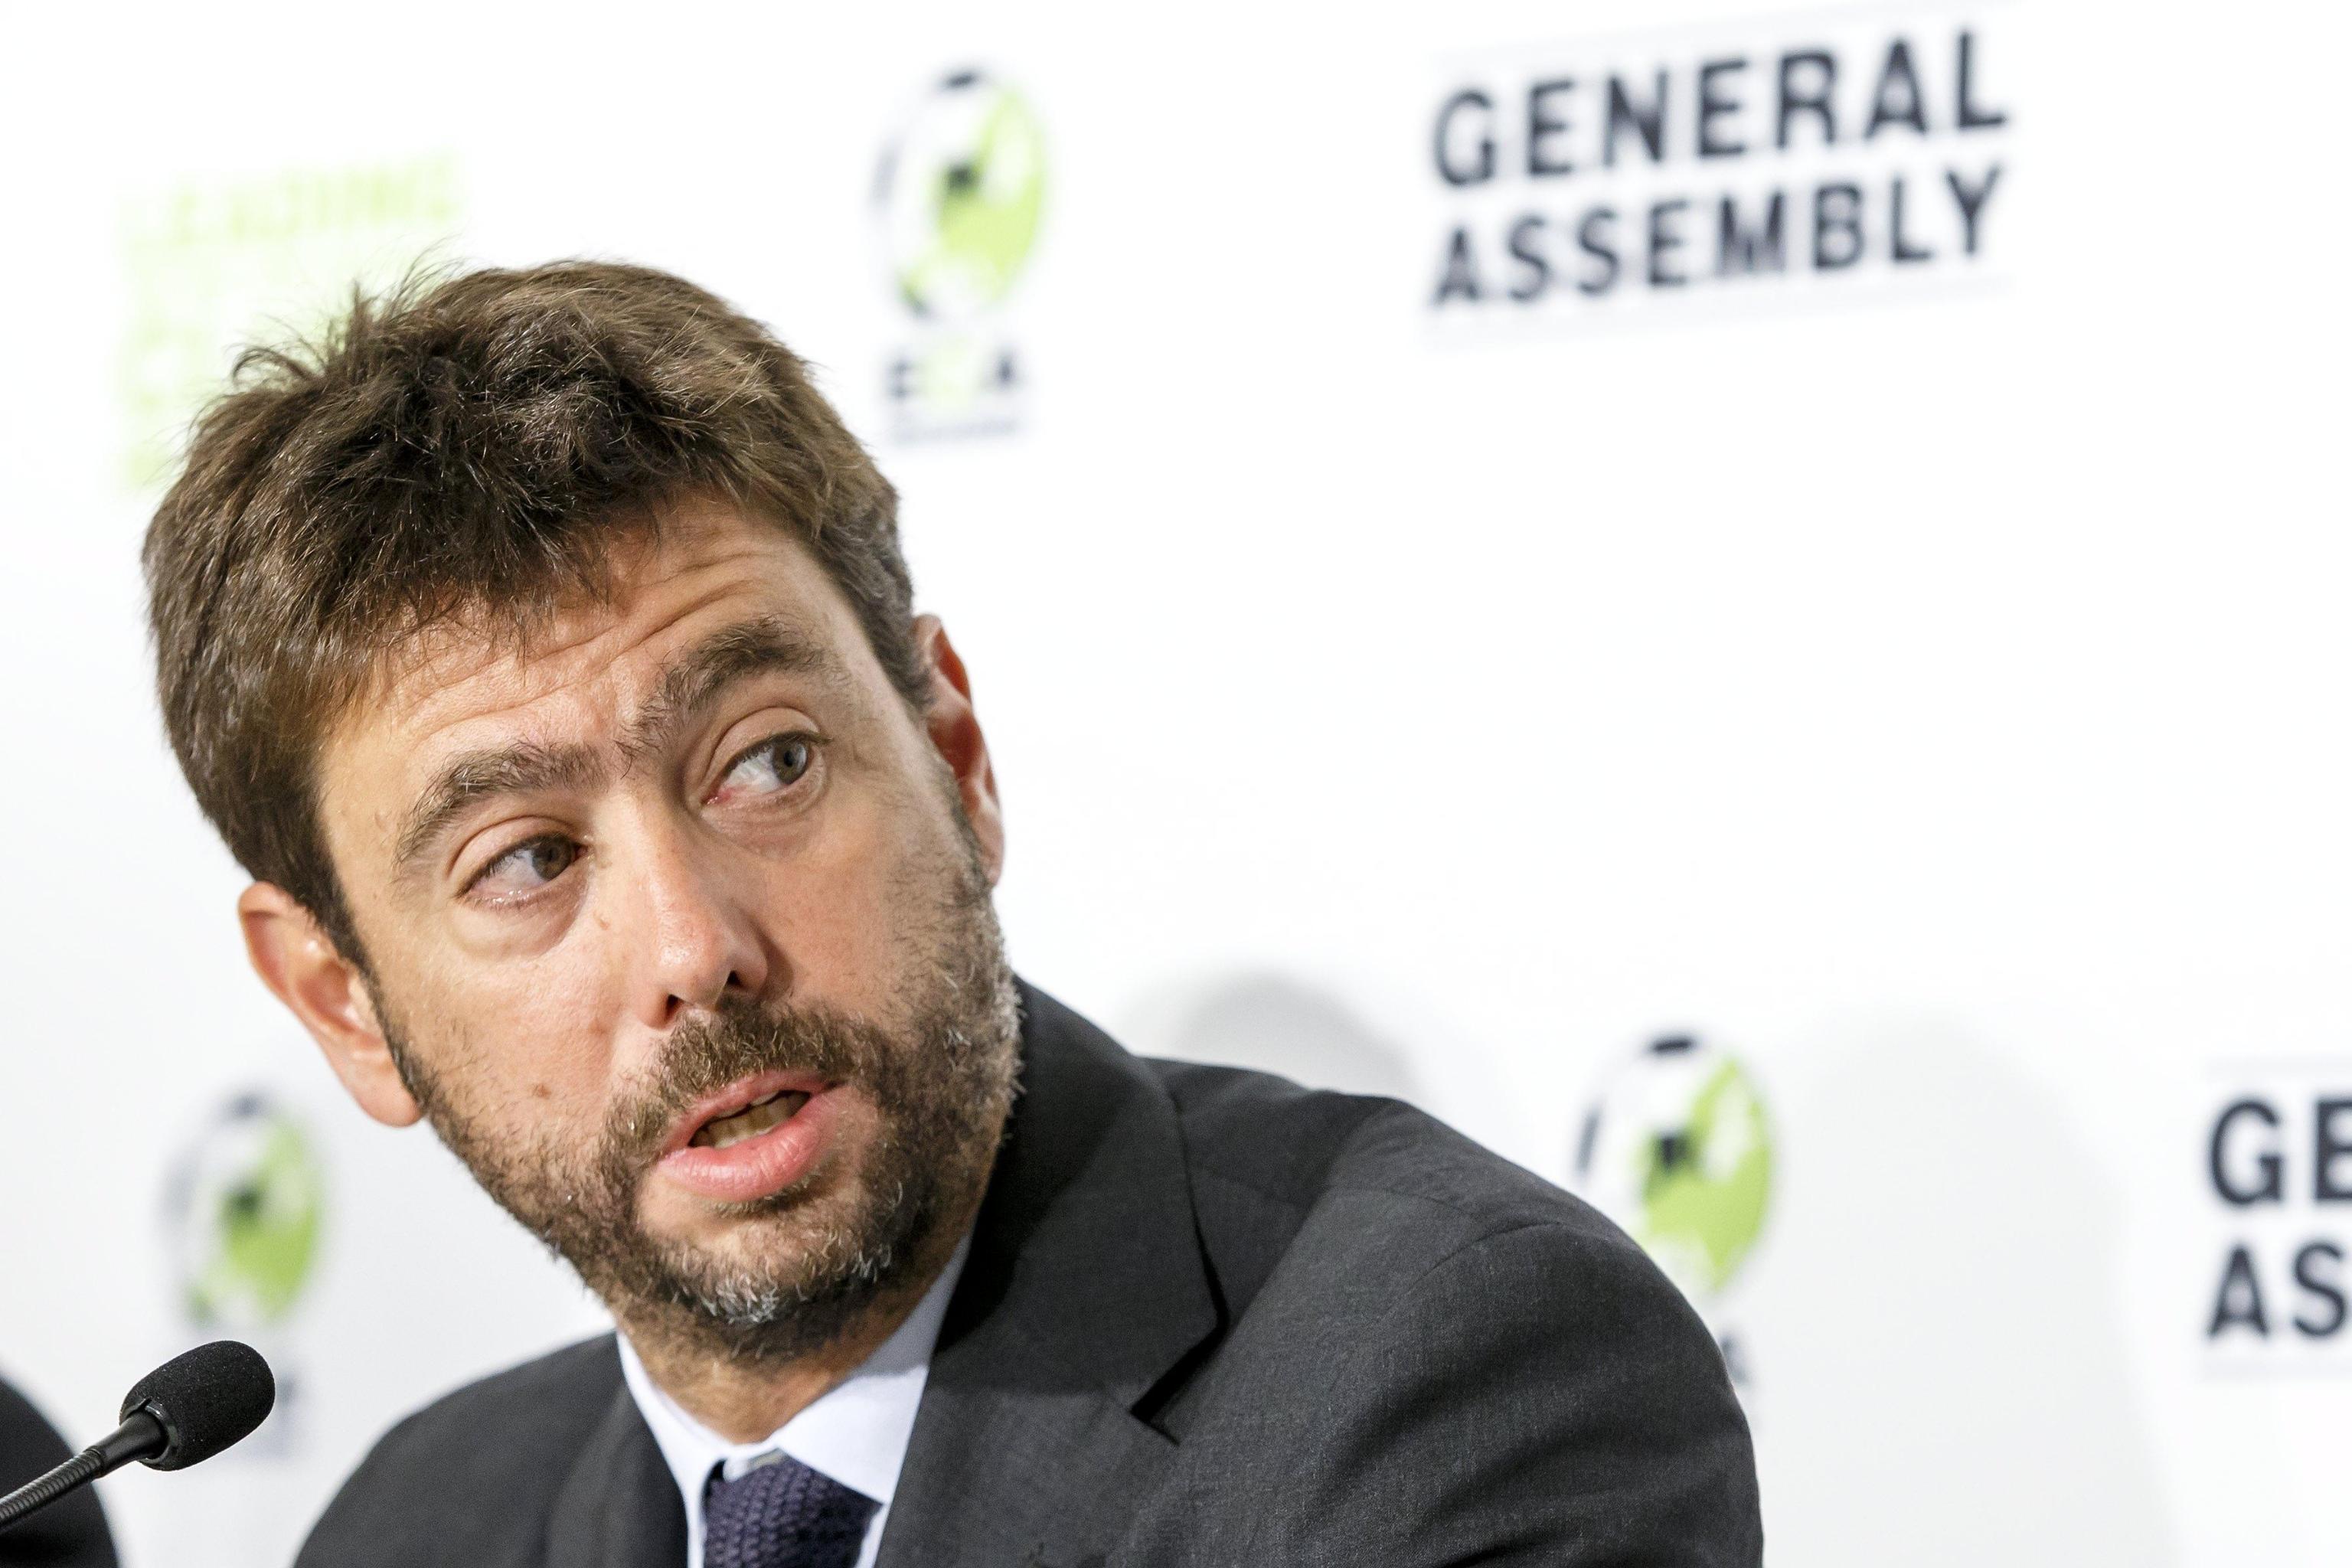 Calendario Internazionale.Uefa Agnelli Serve Un Nuovo Calendario Internazionale In